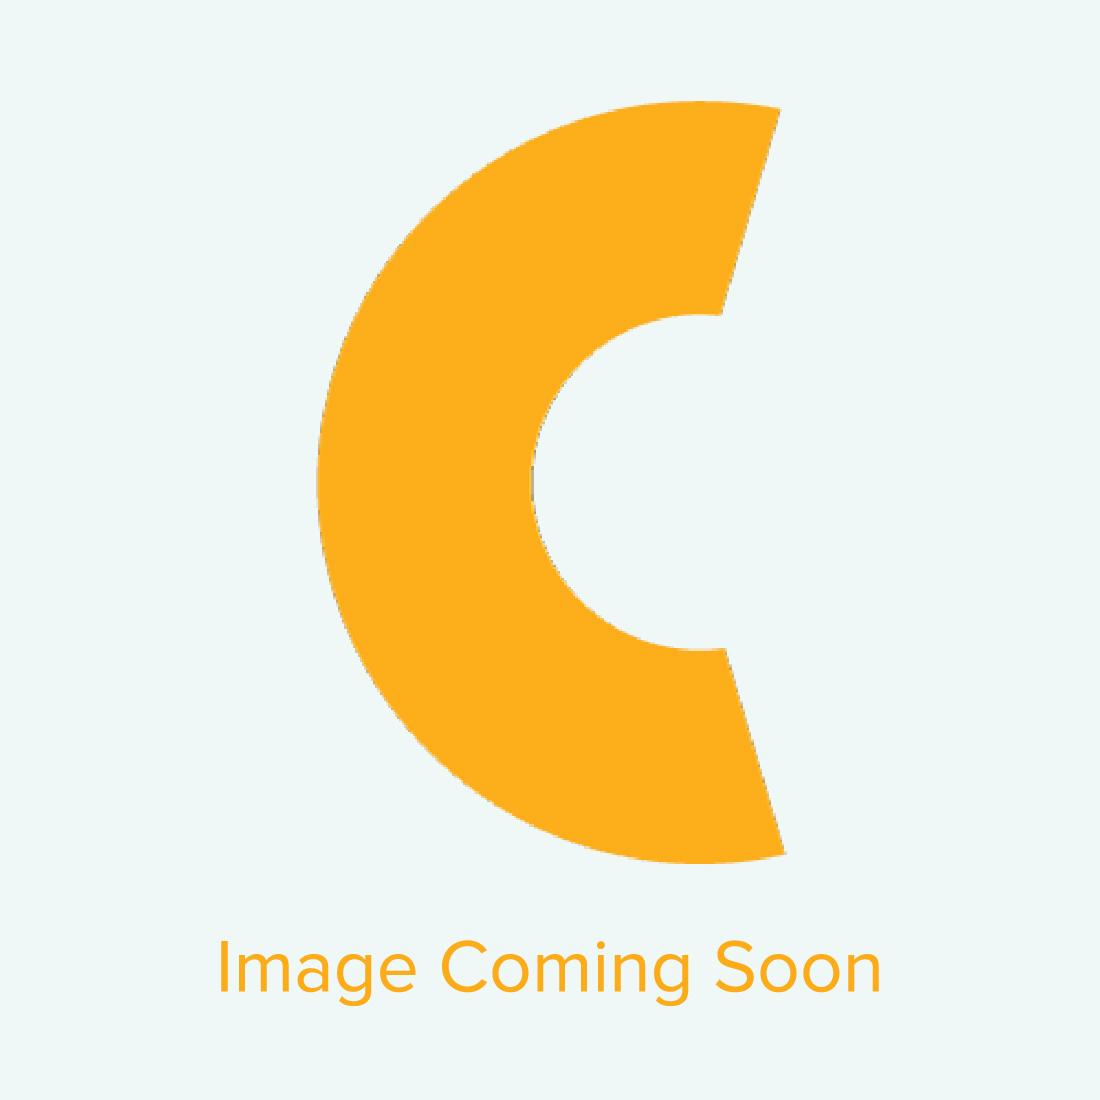 "Sublimation Photo Slate Rock Plaque - Small Rectangle - 4.4"" x 8.25"" (32/case)"